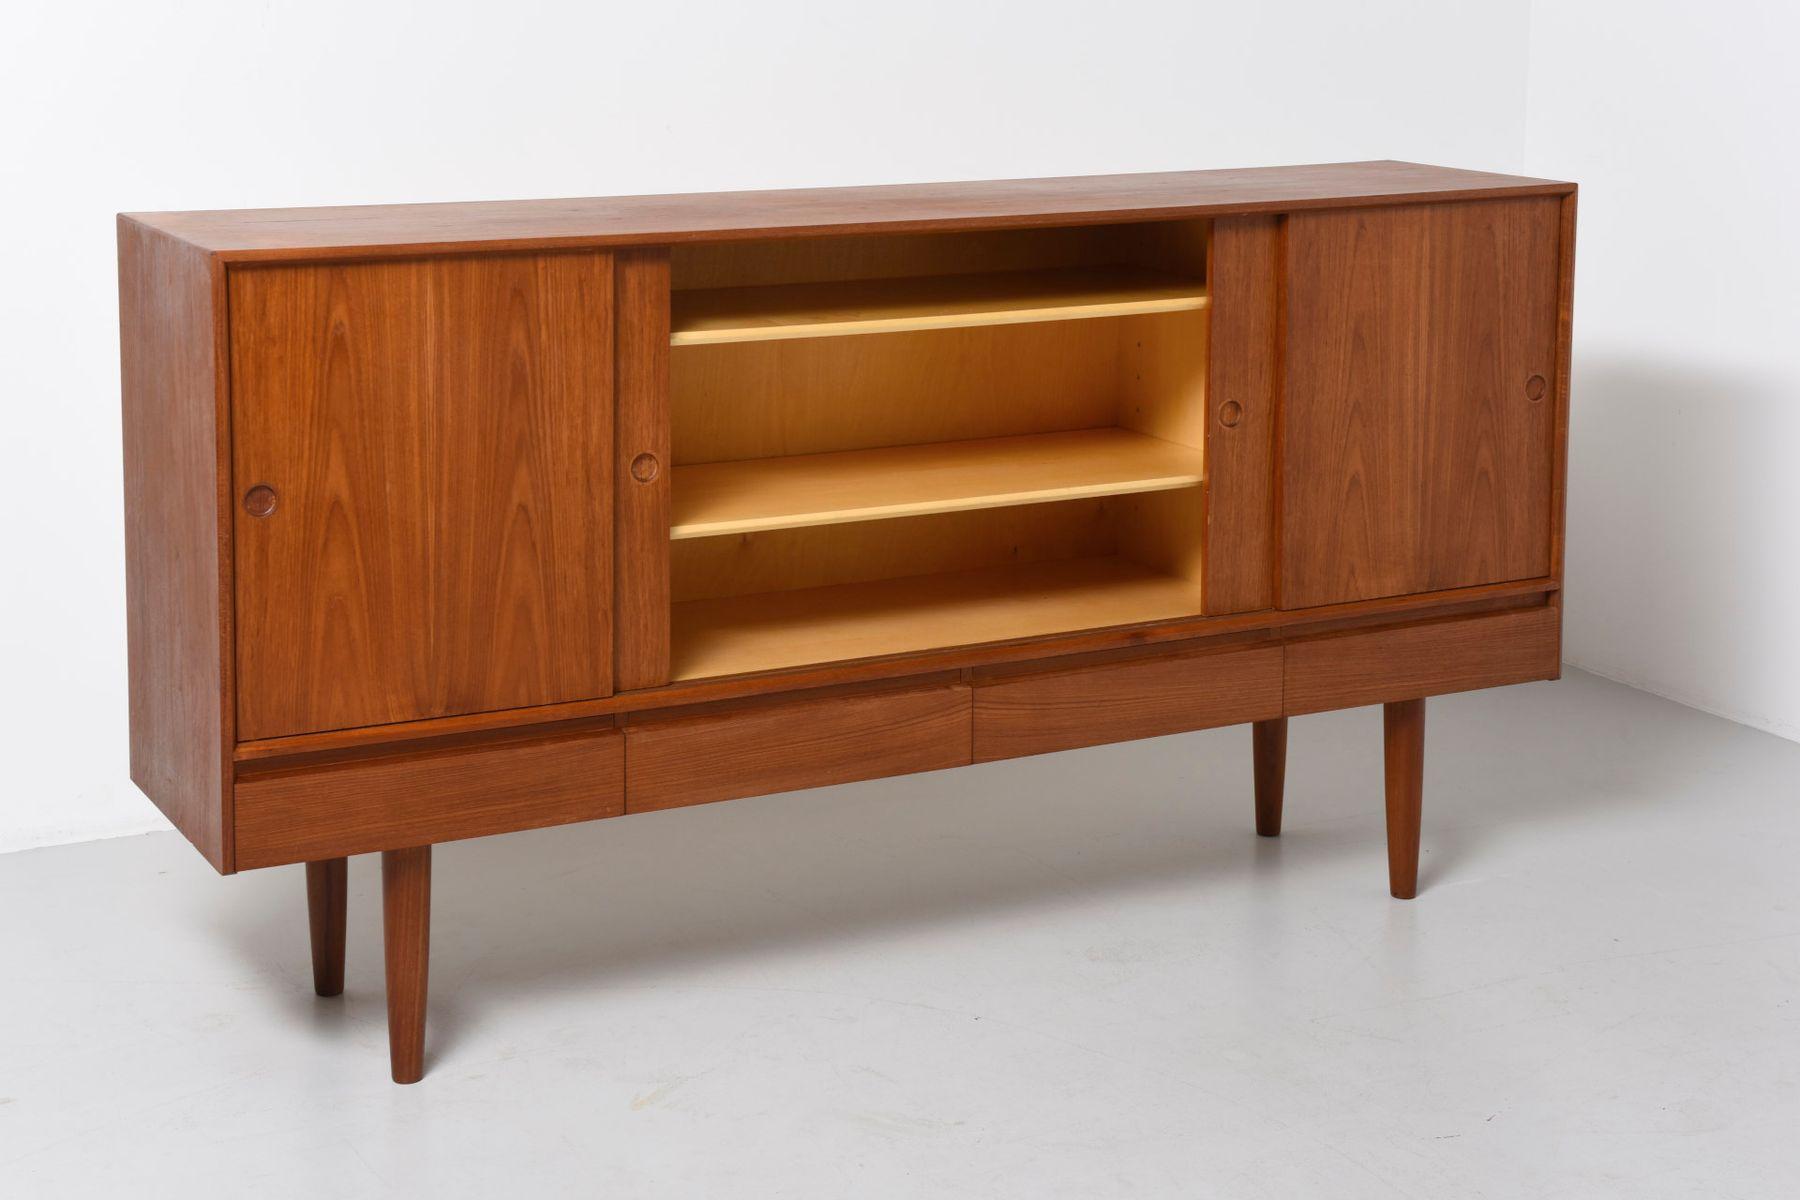 d nisches vintage teak sideboard bei pamono kaufen. Black Bedroom Furniture Sets. Home Design Ideas